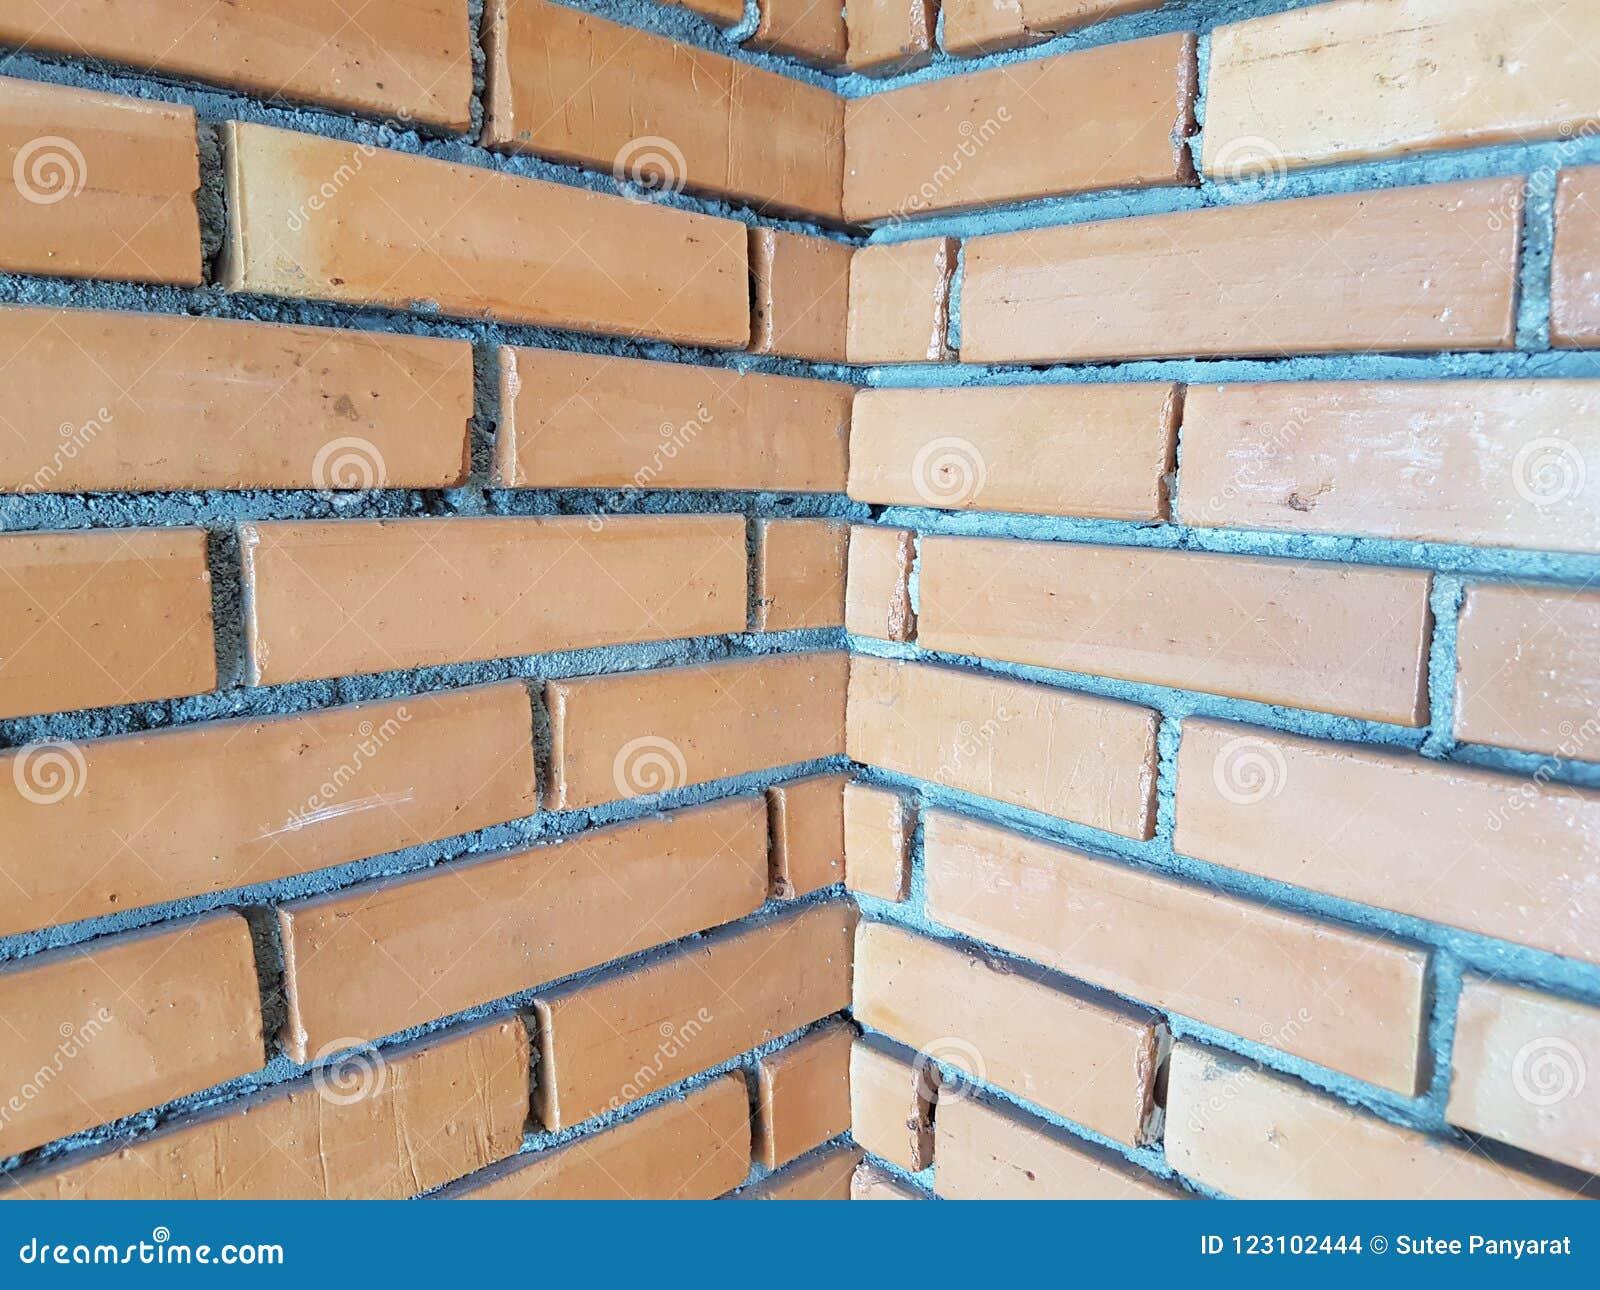 Modularna Cegla Zdjecie Stock Obraz Zlozonej Z Blok 123102444